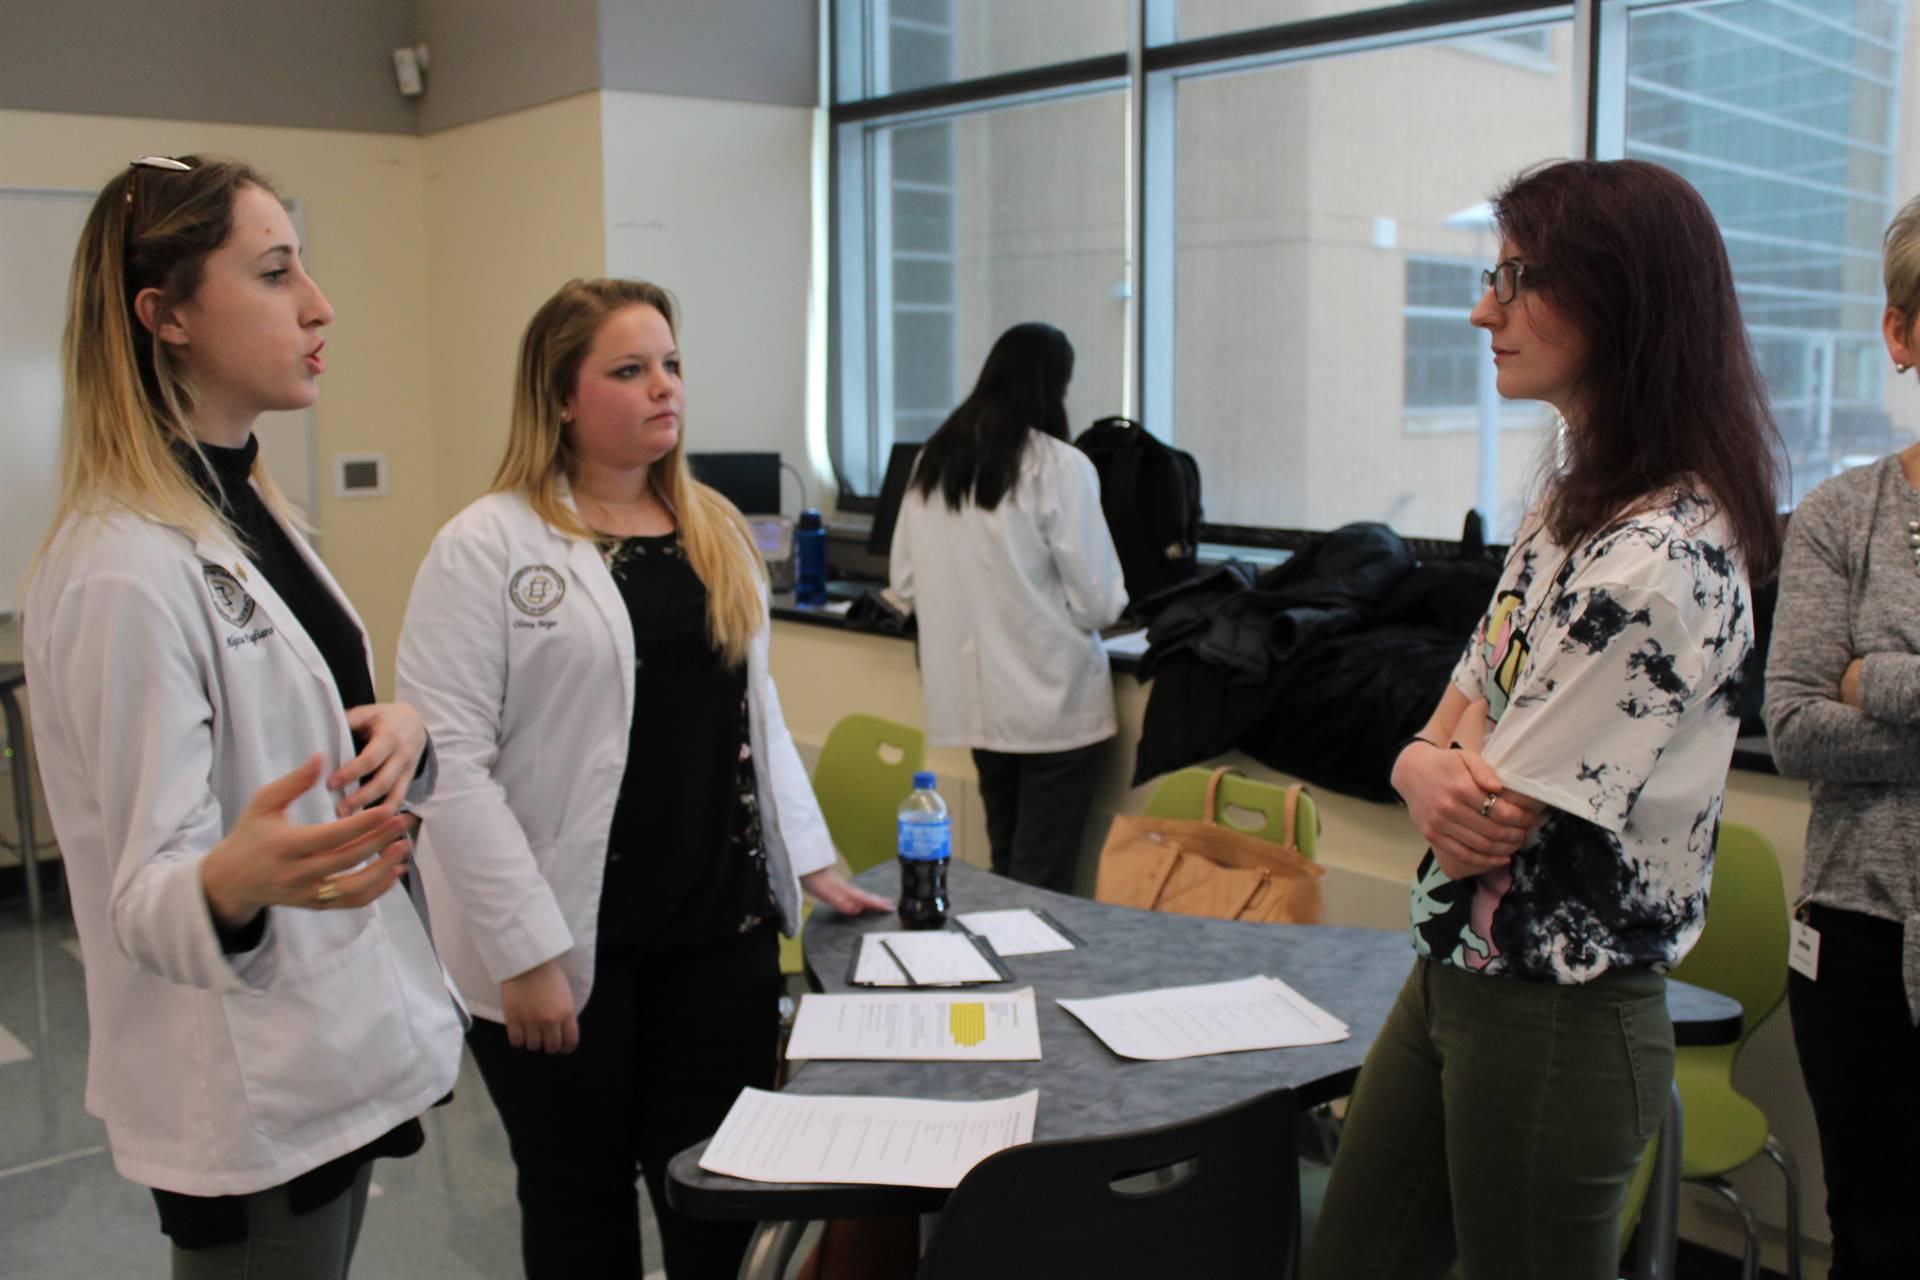 BPHS student talking to two Pitt Pharmacy student